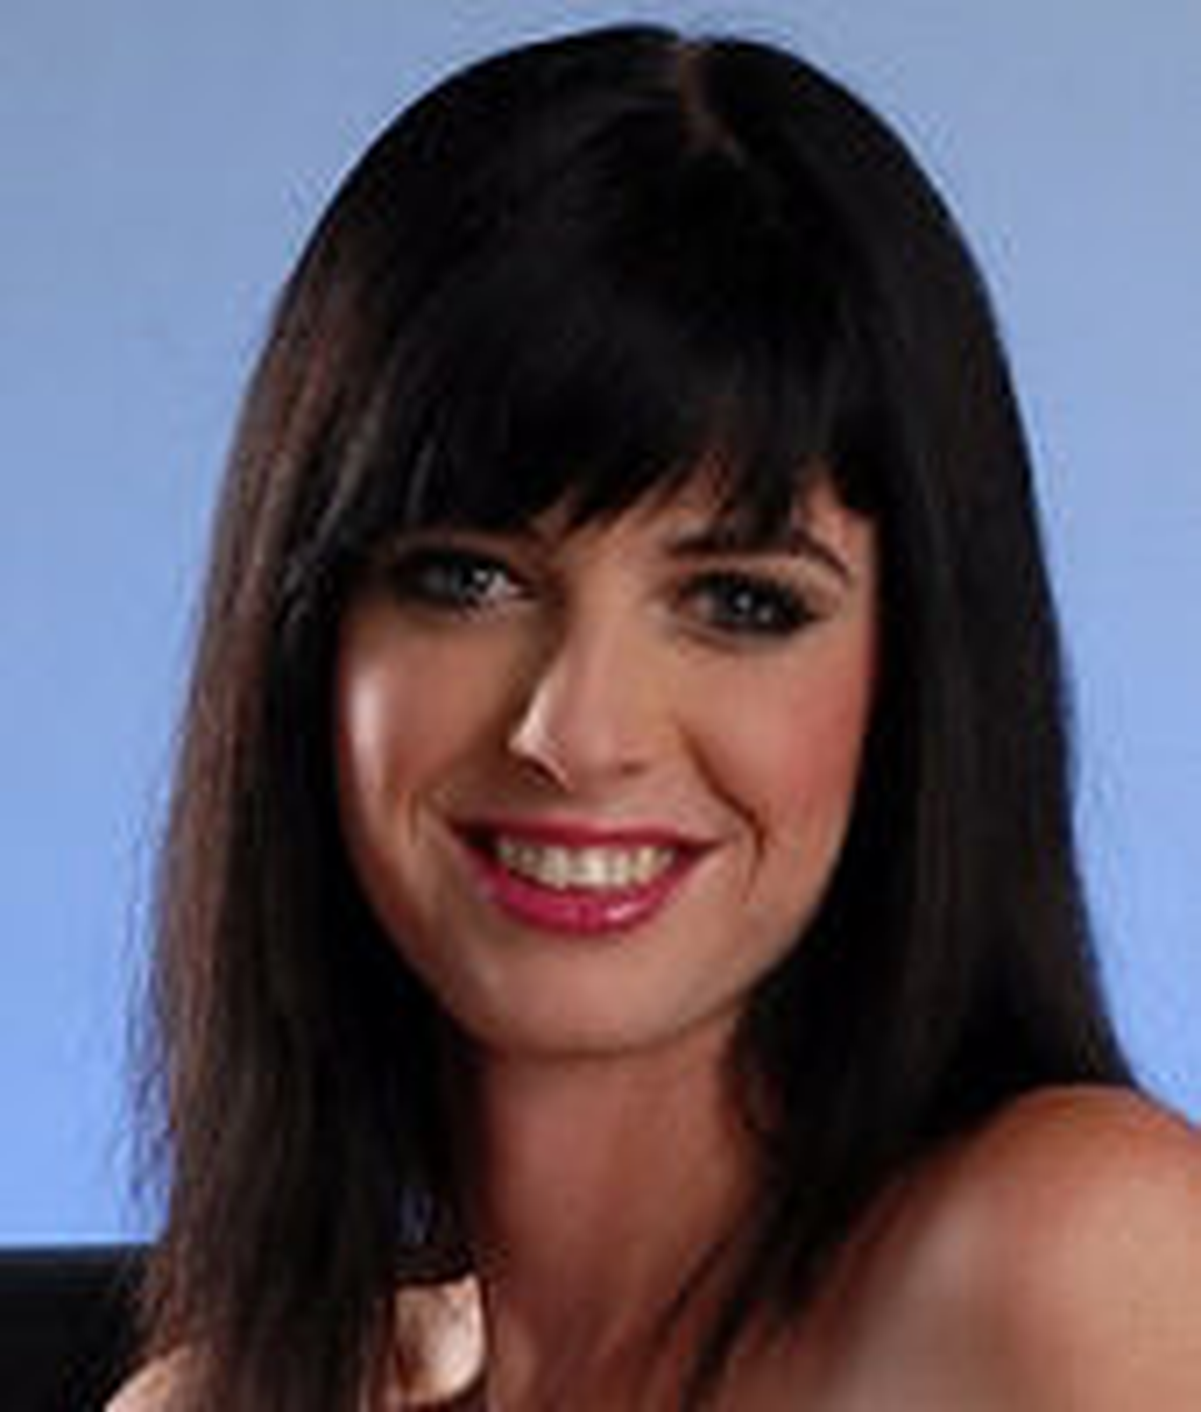 Mandy Mitchell